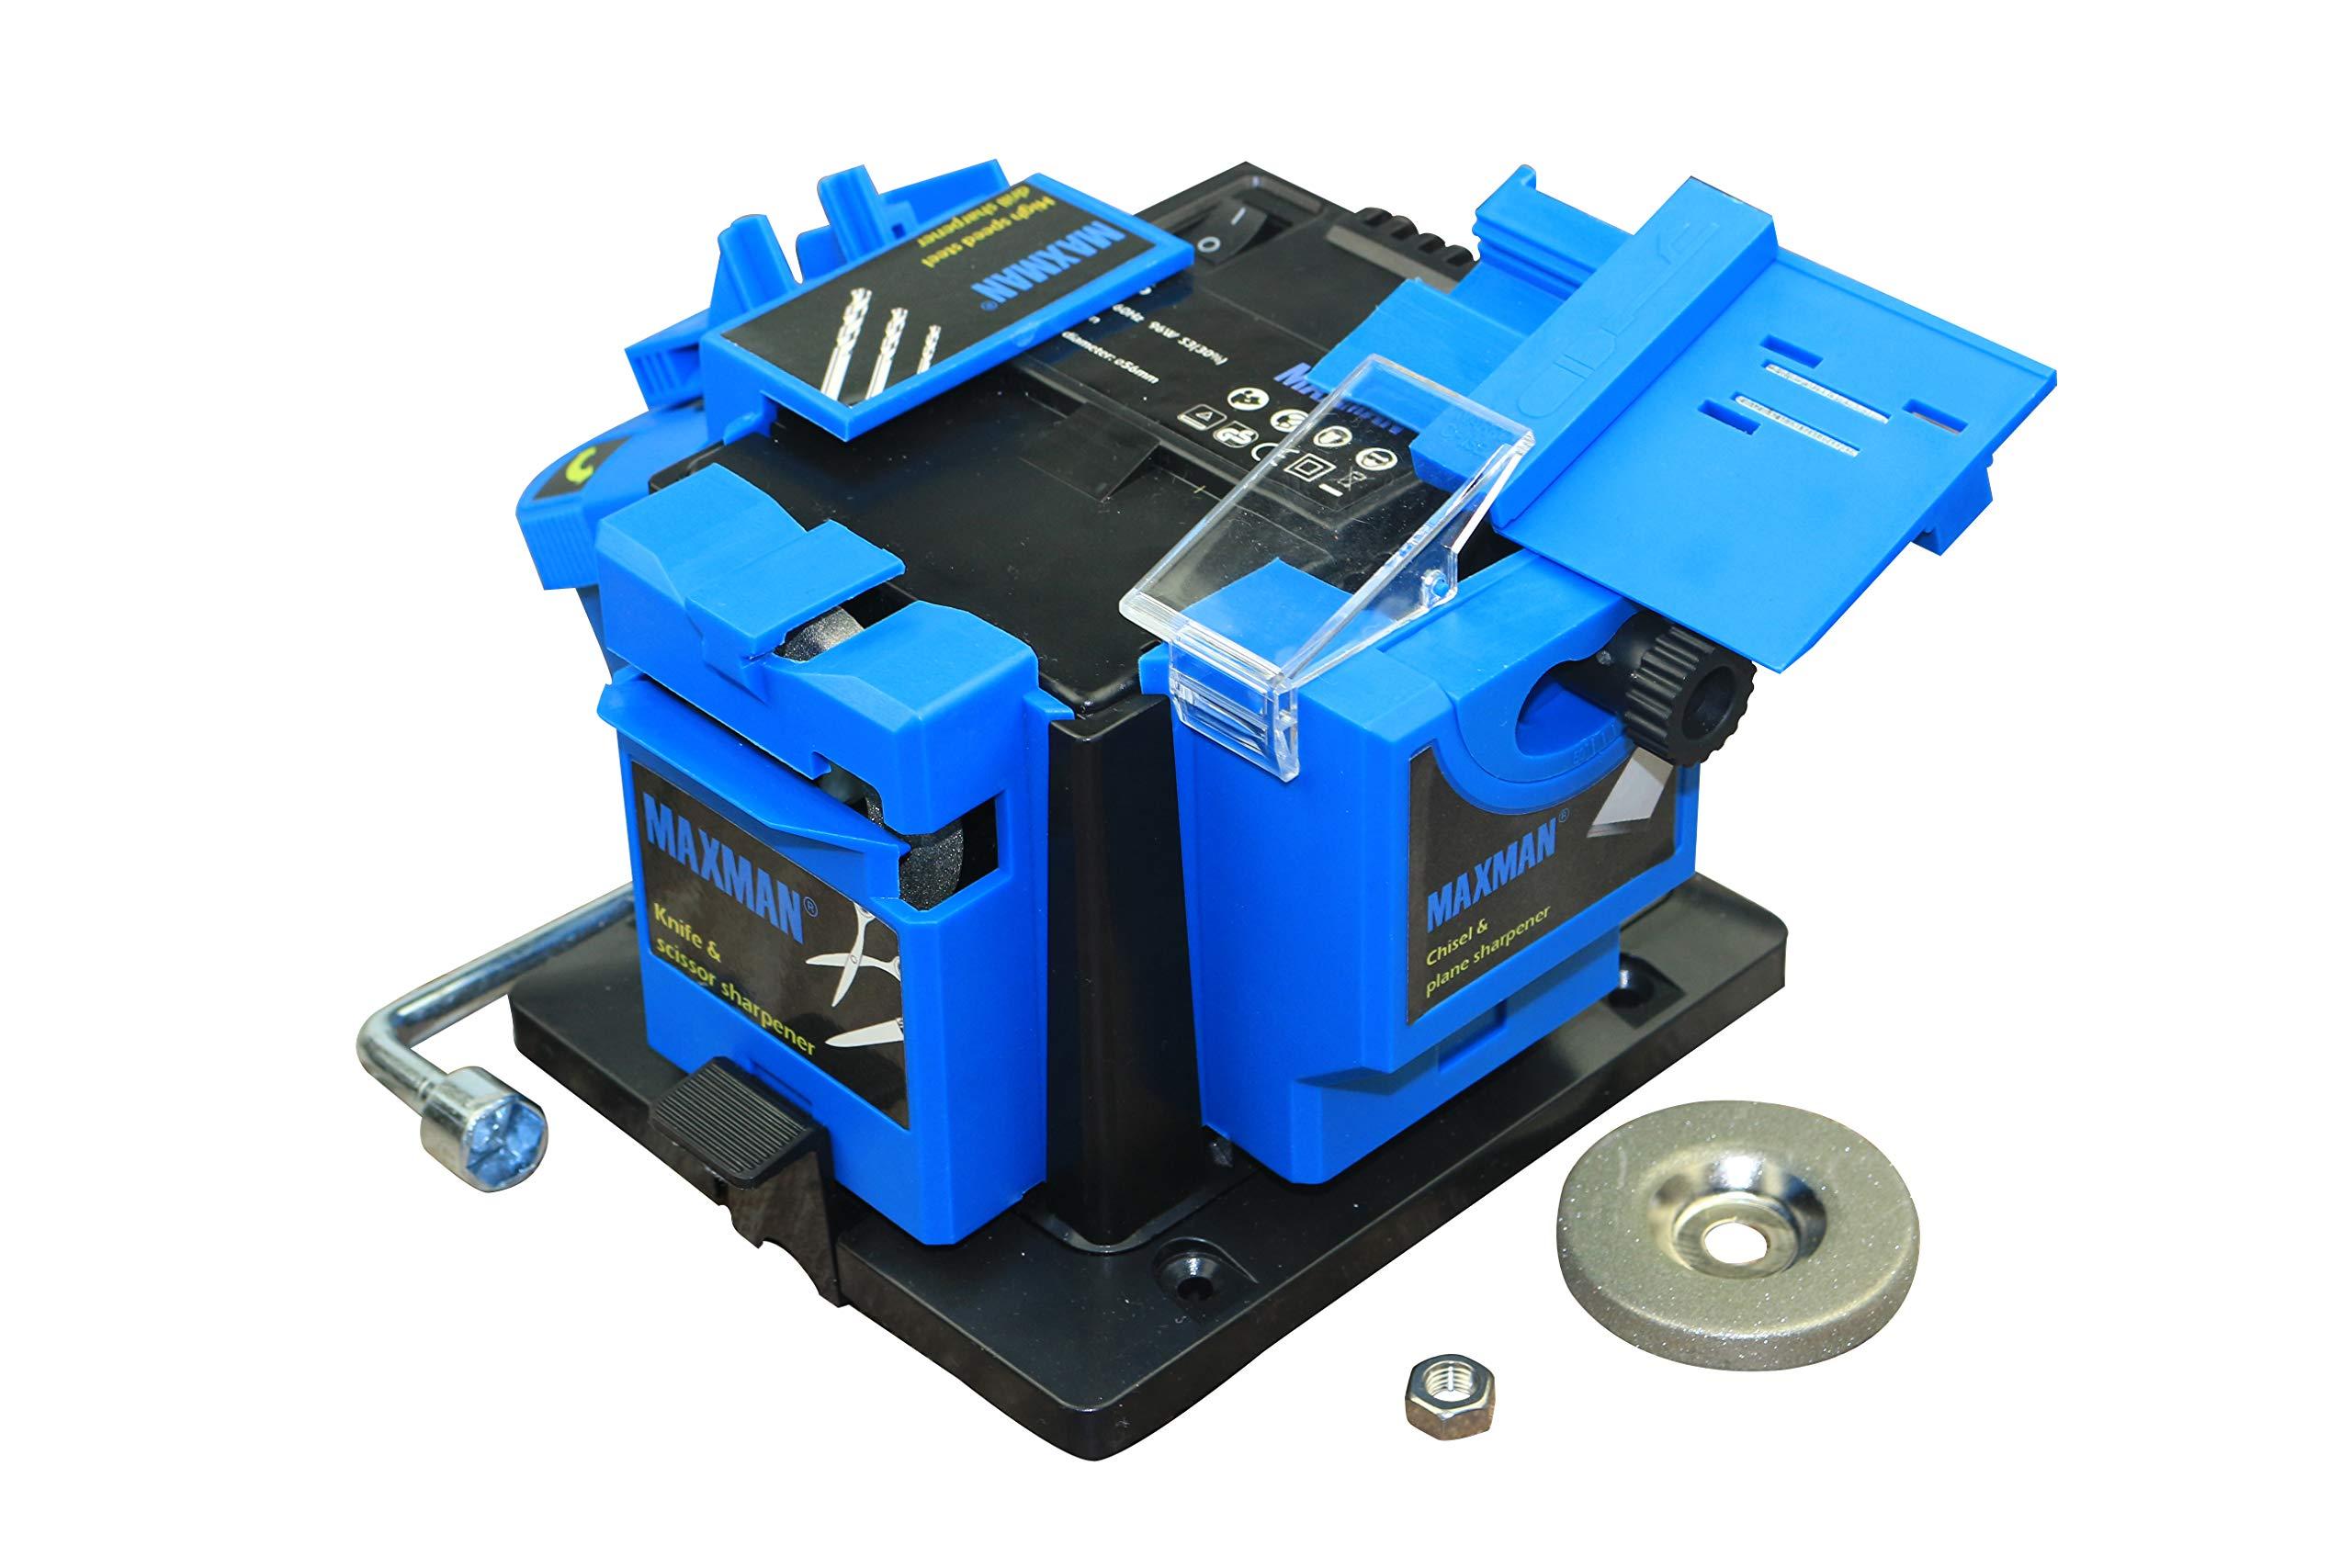 MAXMAN Professional Electric Sharpener Sharpening